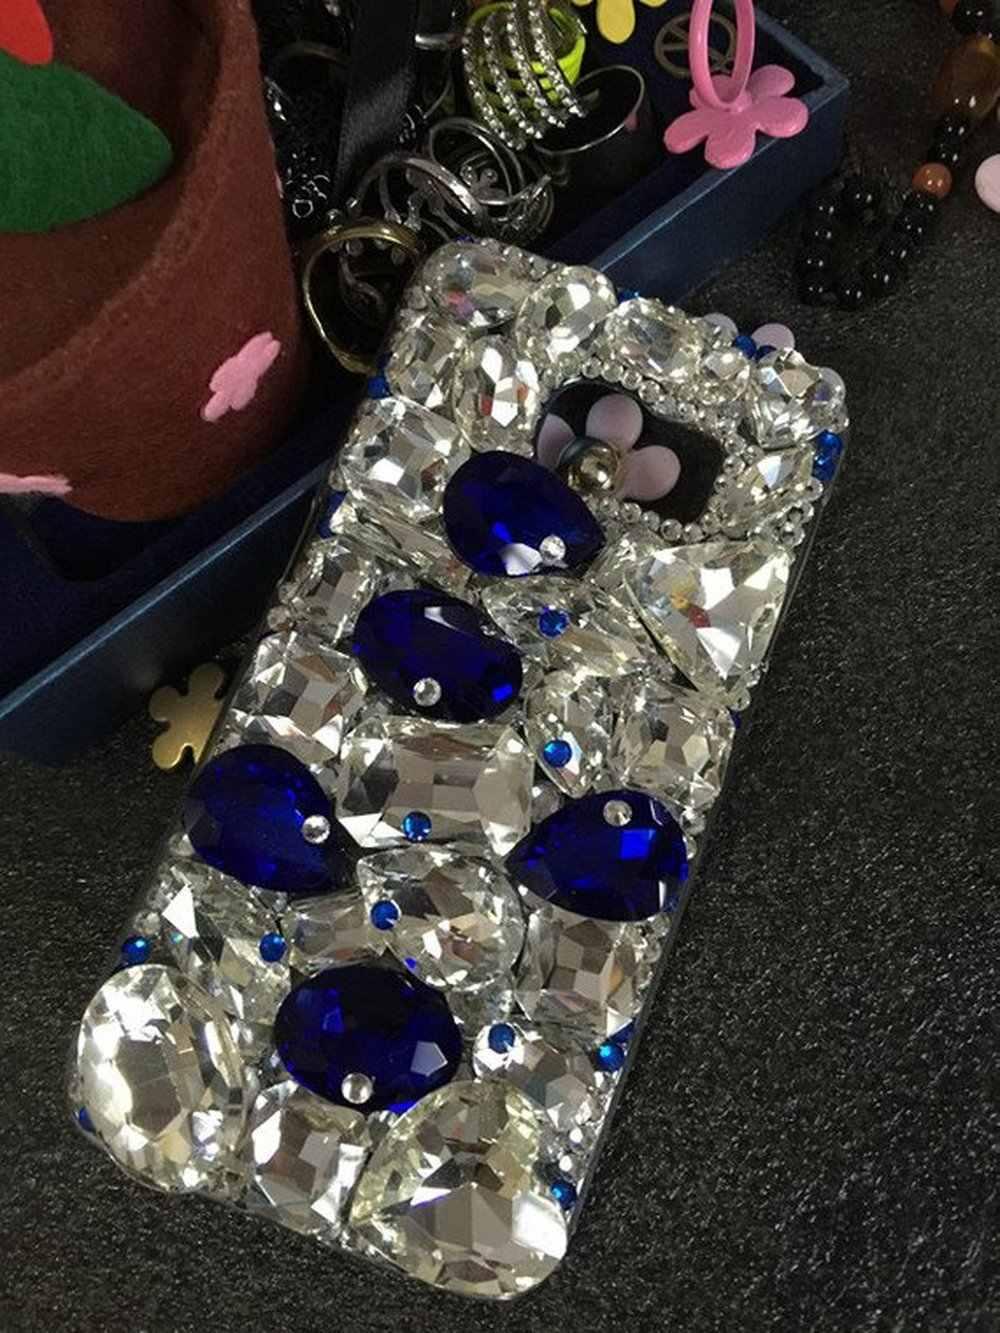 XINGDUO Clear Navy Blue Charm para iphone 8 funda brillante gemas cristales pedrería cubierta para iphone 5/6/7/ 8/X/XS/XR/XS.